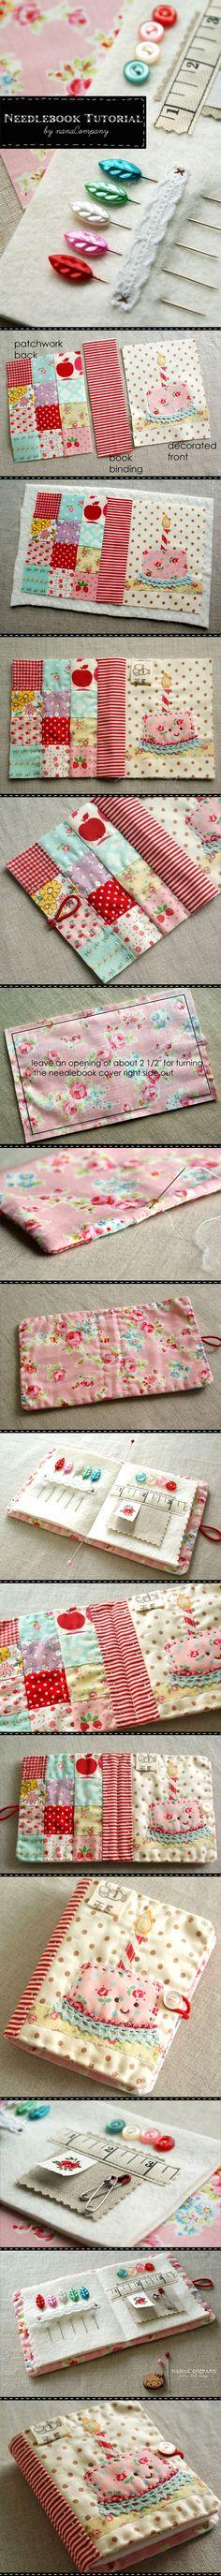 needlebook tutorial | libro per gli aghi | #tutorial #DIY #cucito #sewing #crafting